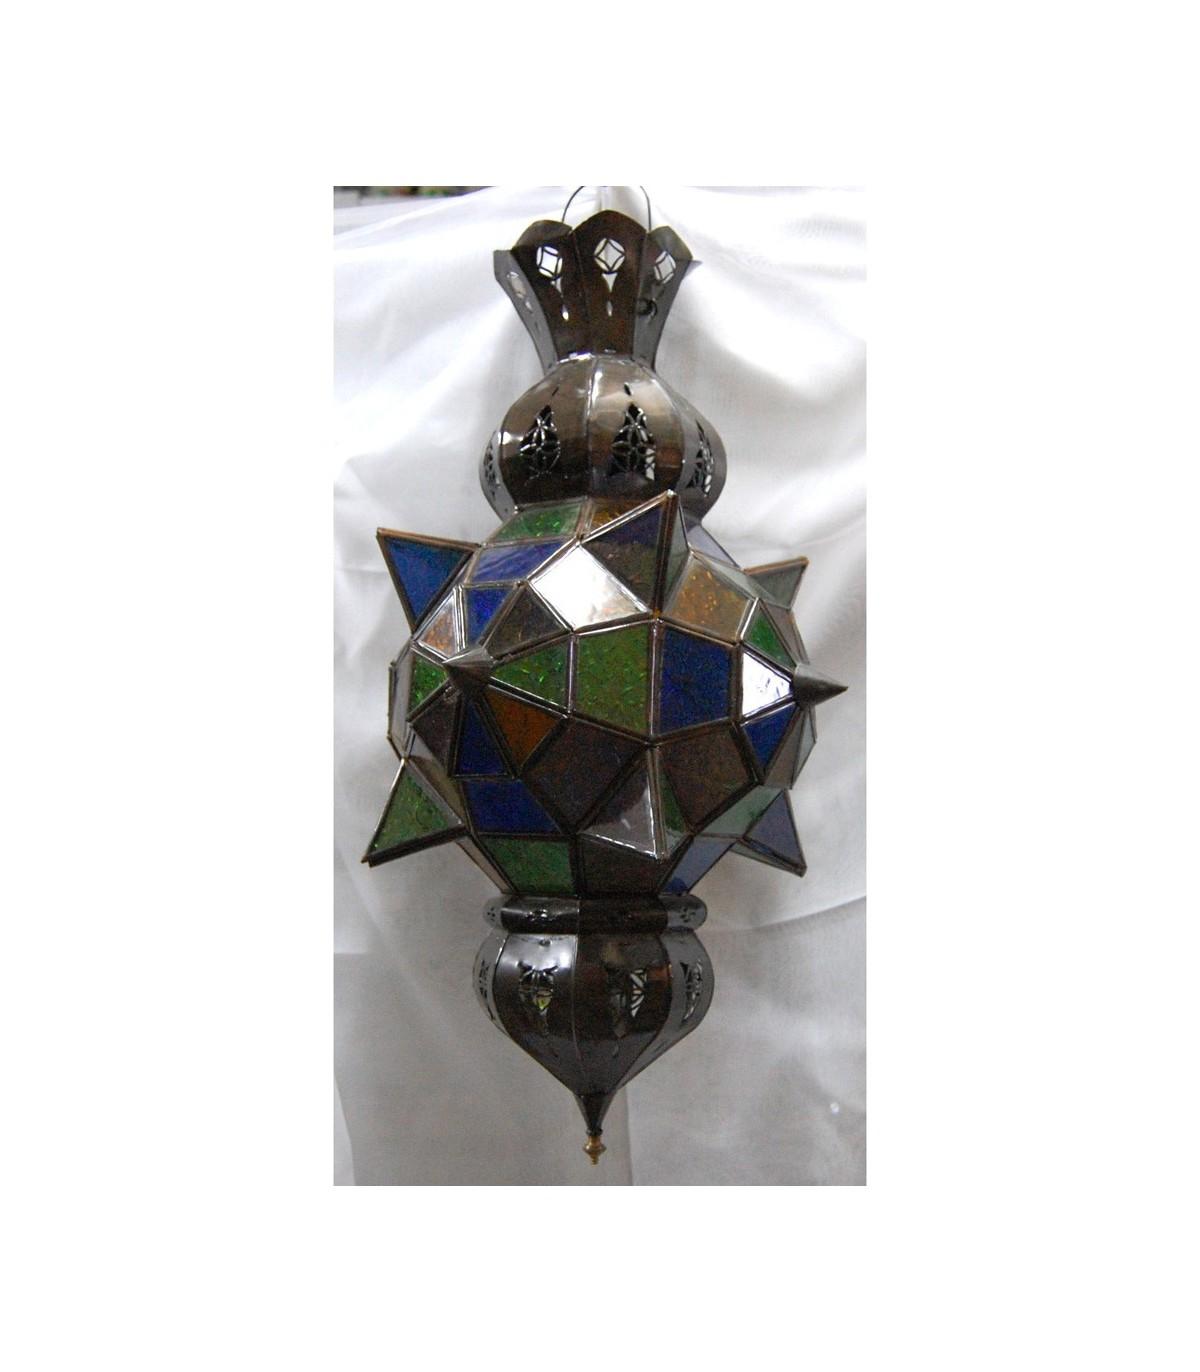 L mpara cristal lucero de alba colores andalus rabe - Lamparas de cristal de colores ...